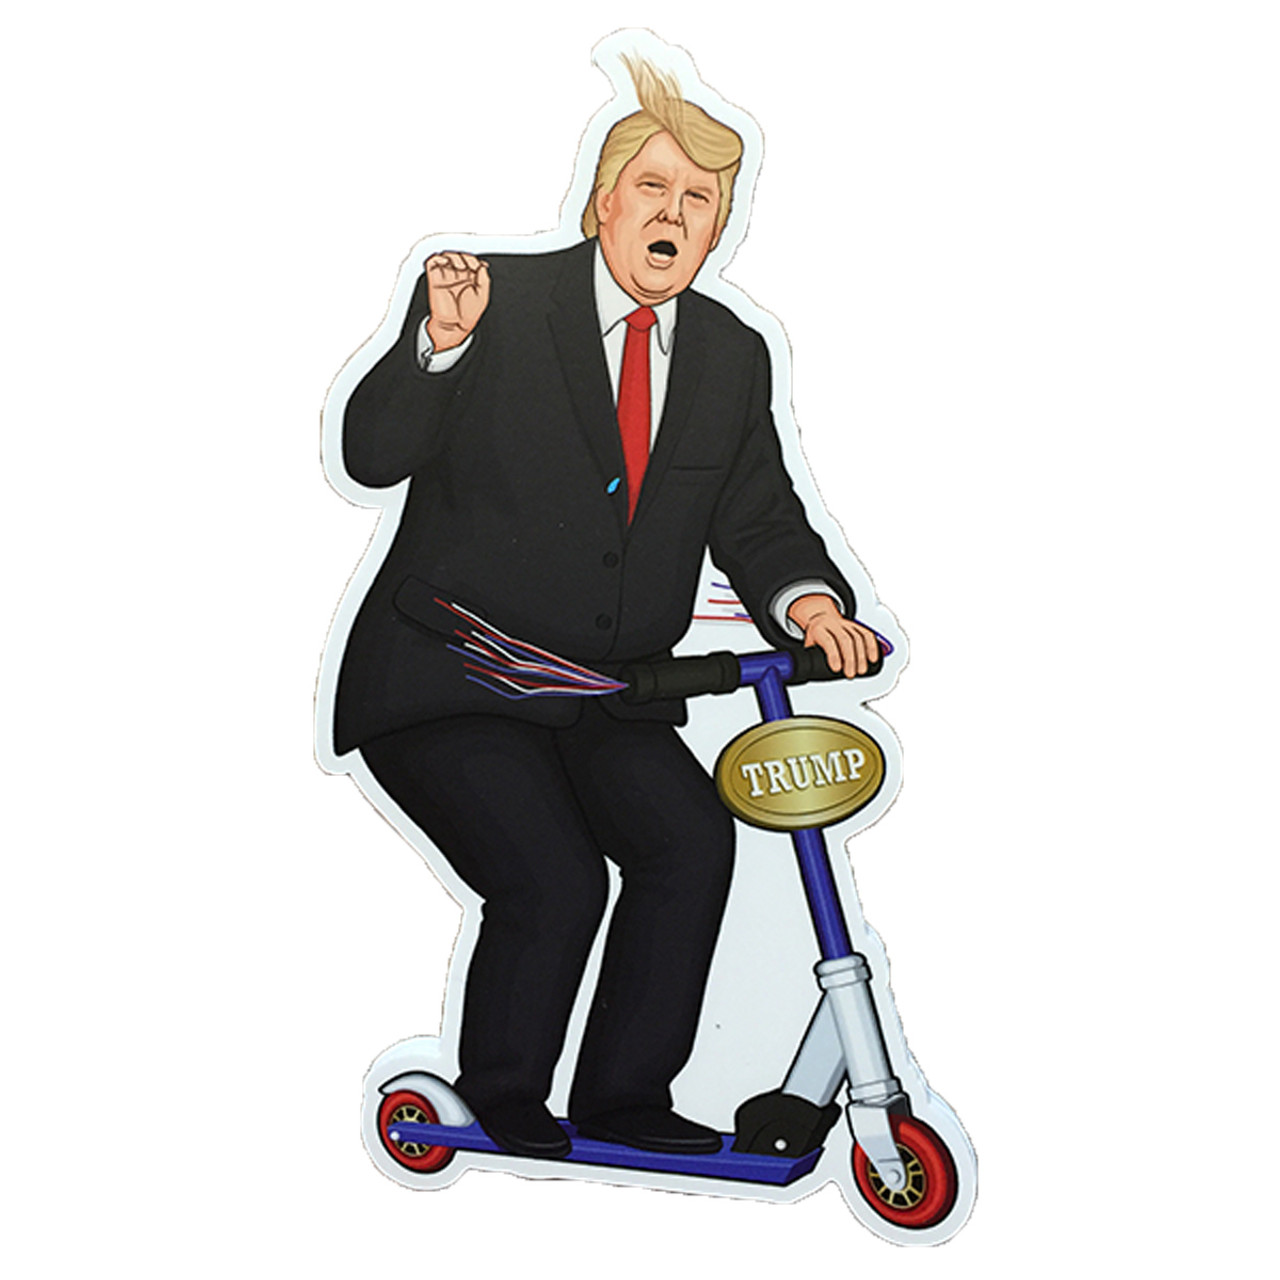 Trump Rides A Scooter Unheard